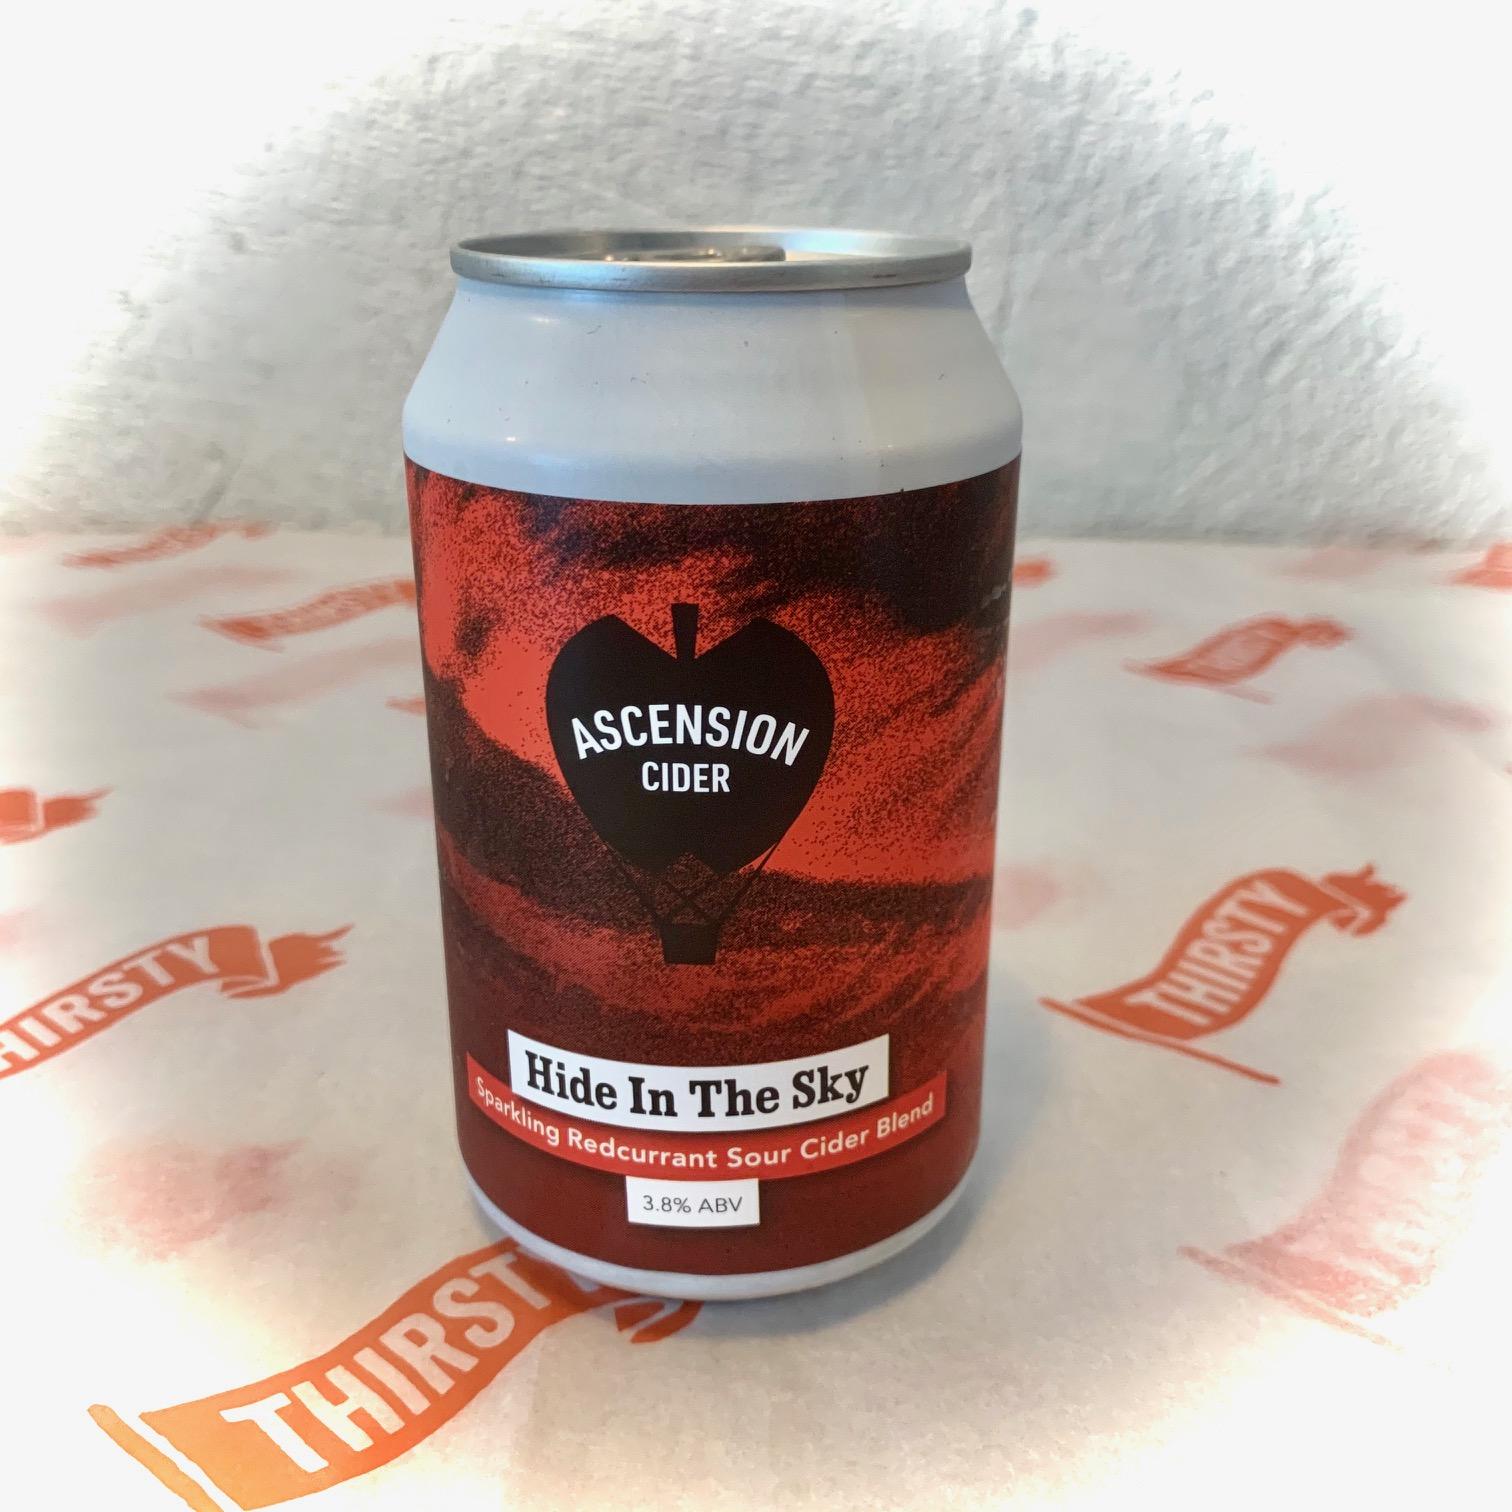 Ascension | Hide In The Sky | Sparkling Red Currant Sour Cider Blend 3.8% 330ml